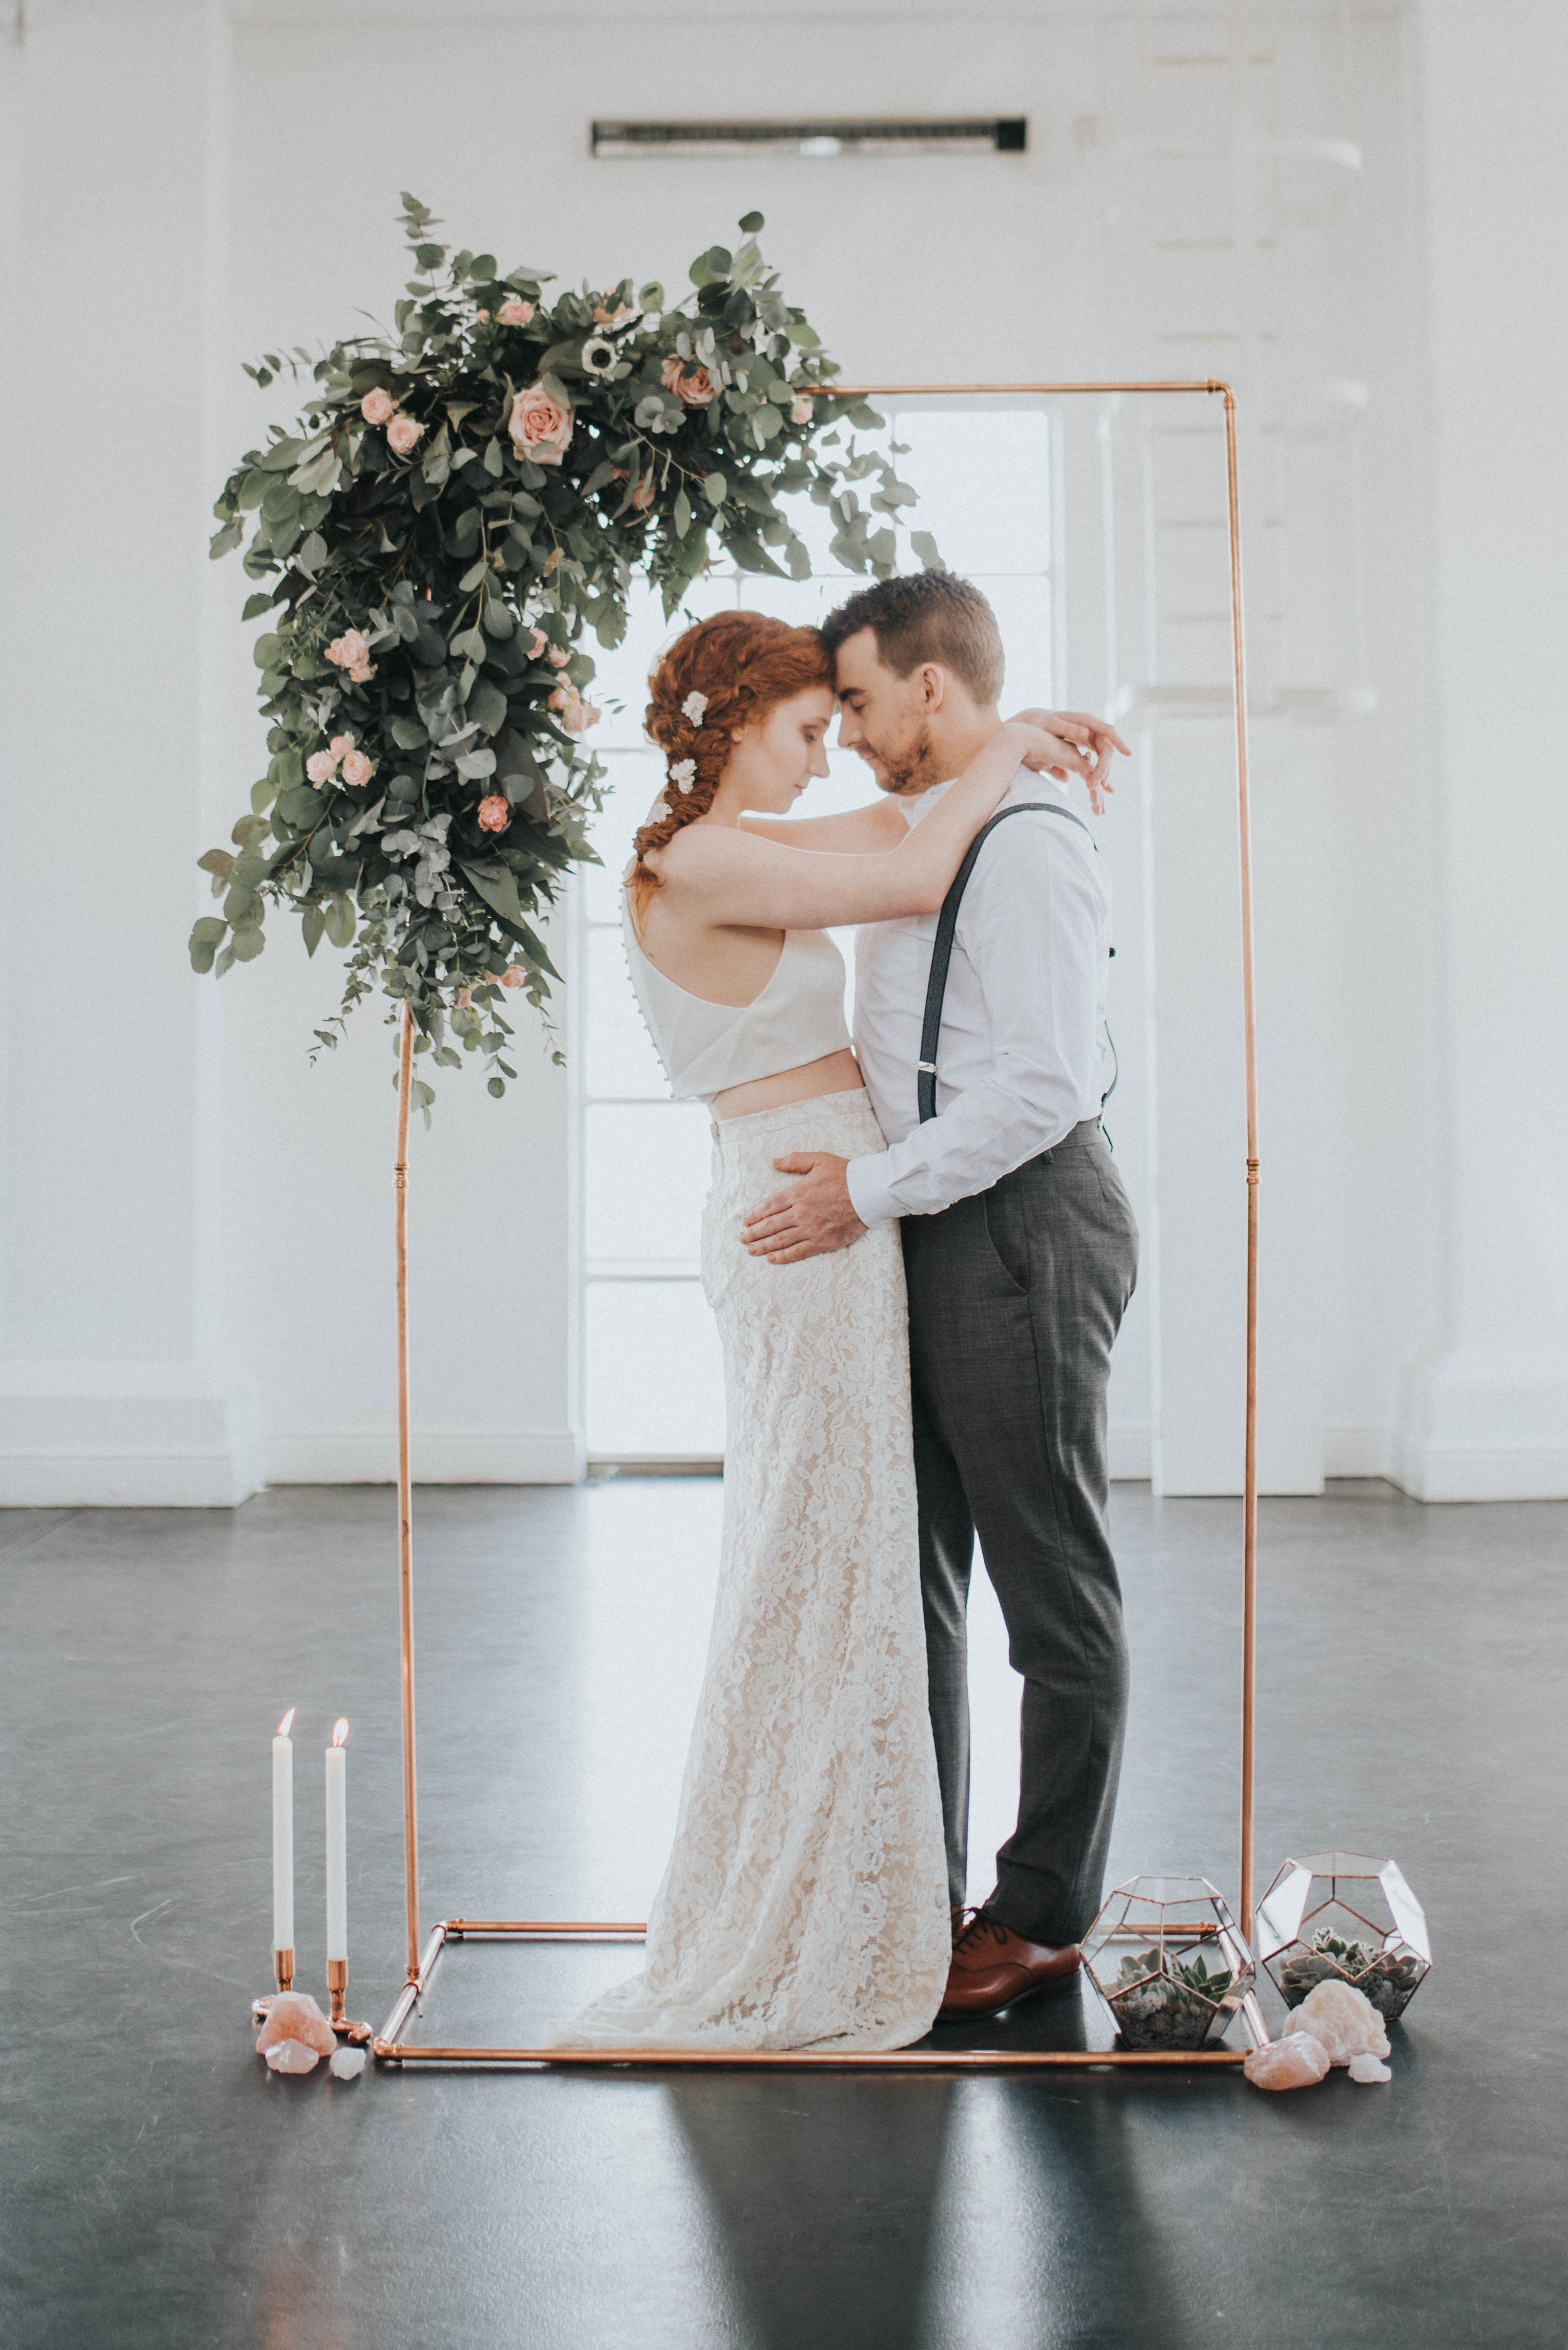 CrystalChic_WeddingInspiration-116.jpg